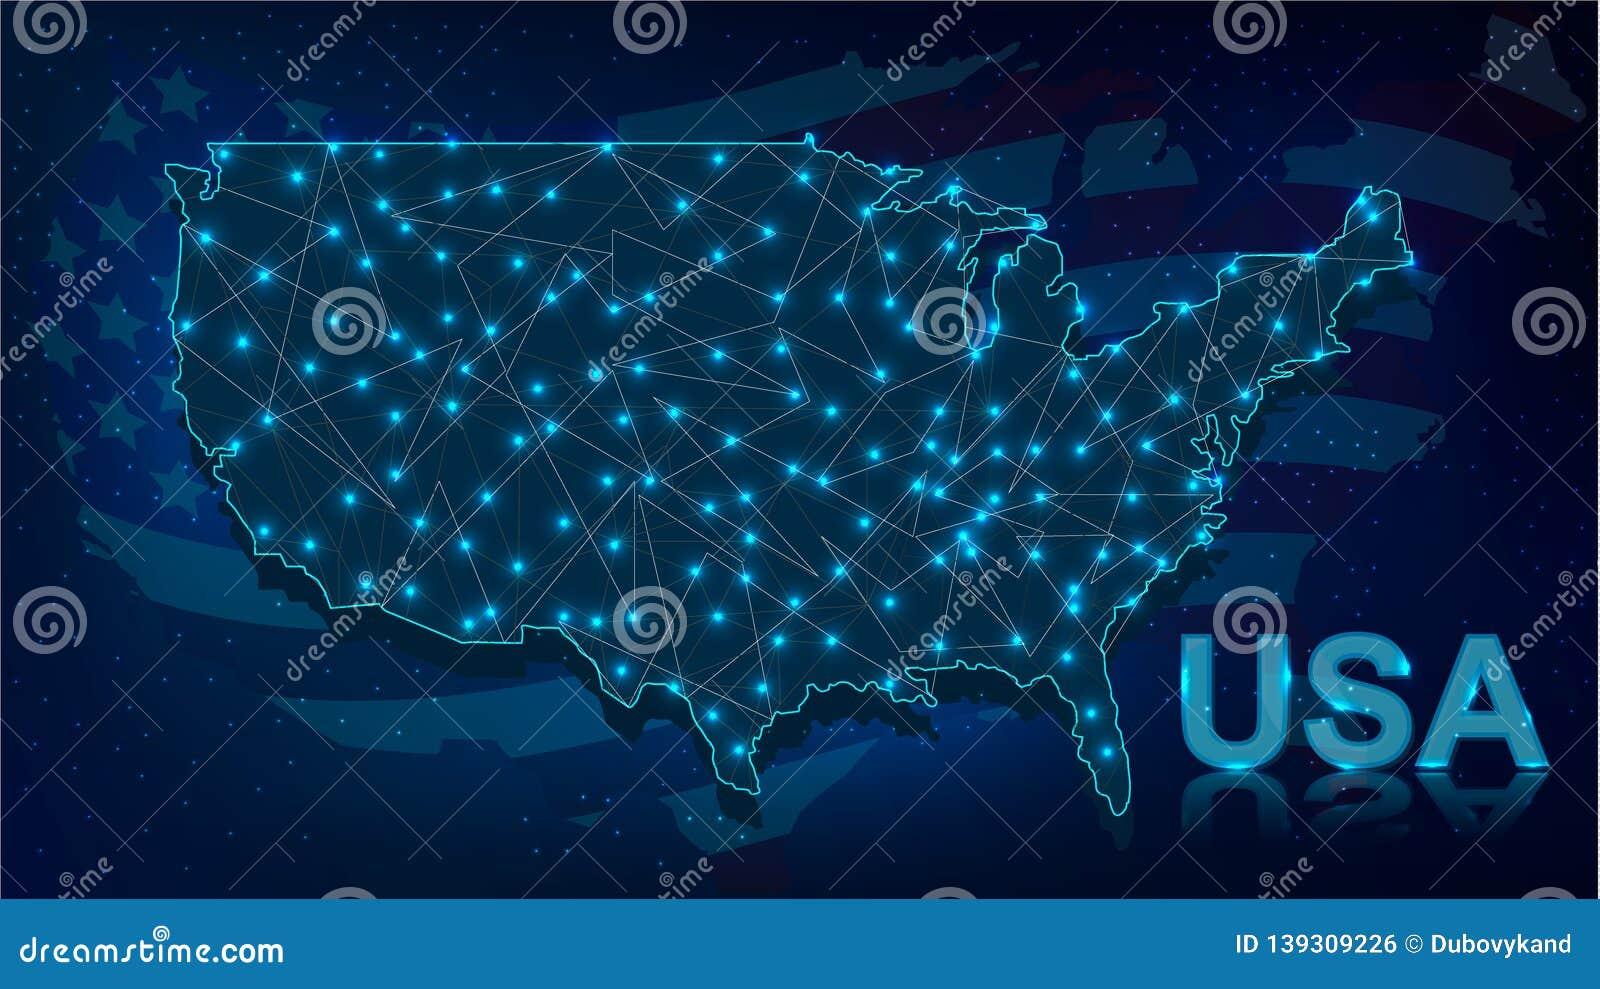 Digital Map of USA with Neon Illuminated Lights